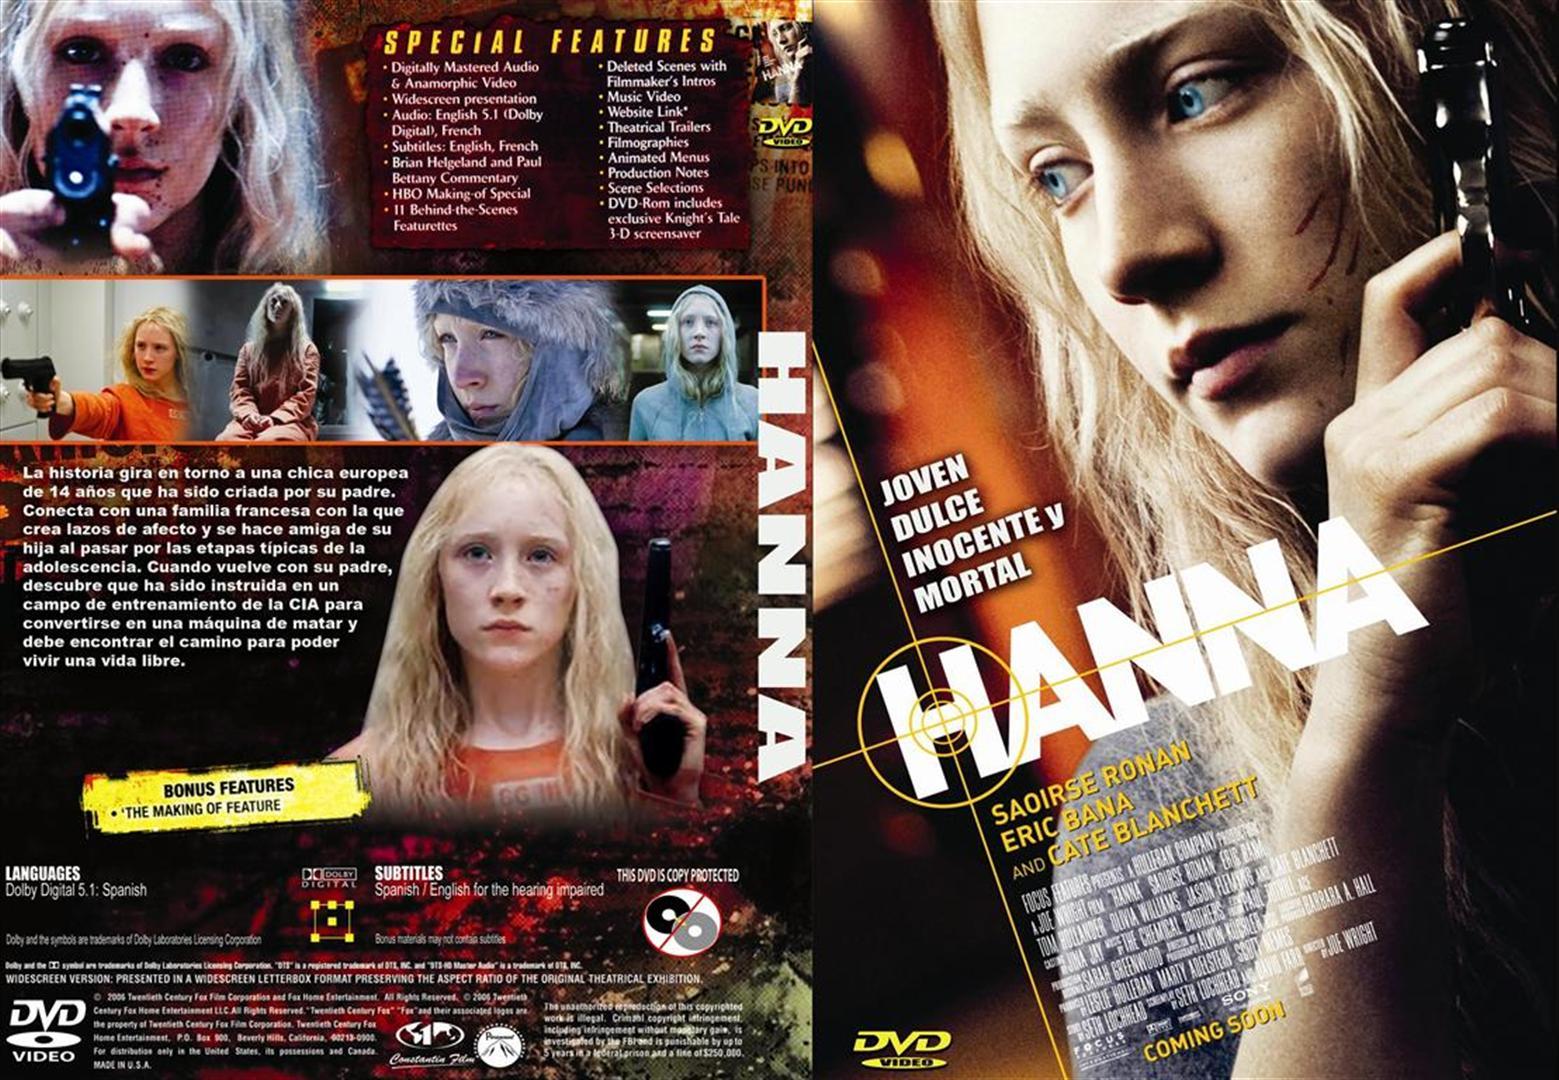 http://3.bp.blogspot.com/-EivIc-5kGyA/TmQqDts6dTI/AAAAAAAADRY/NVKIqw1VPwY/s1600/Hanna.JPG